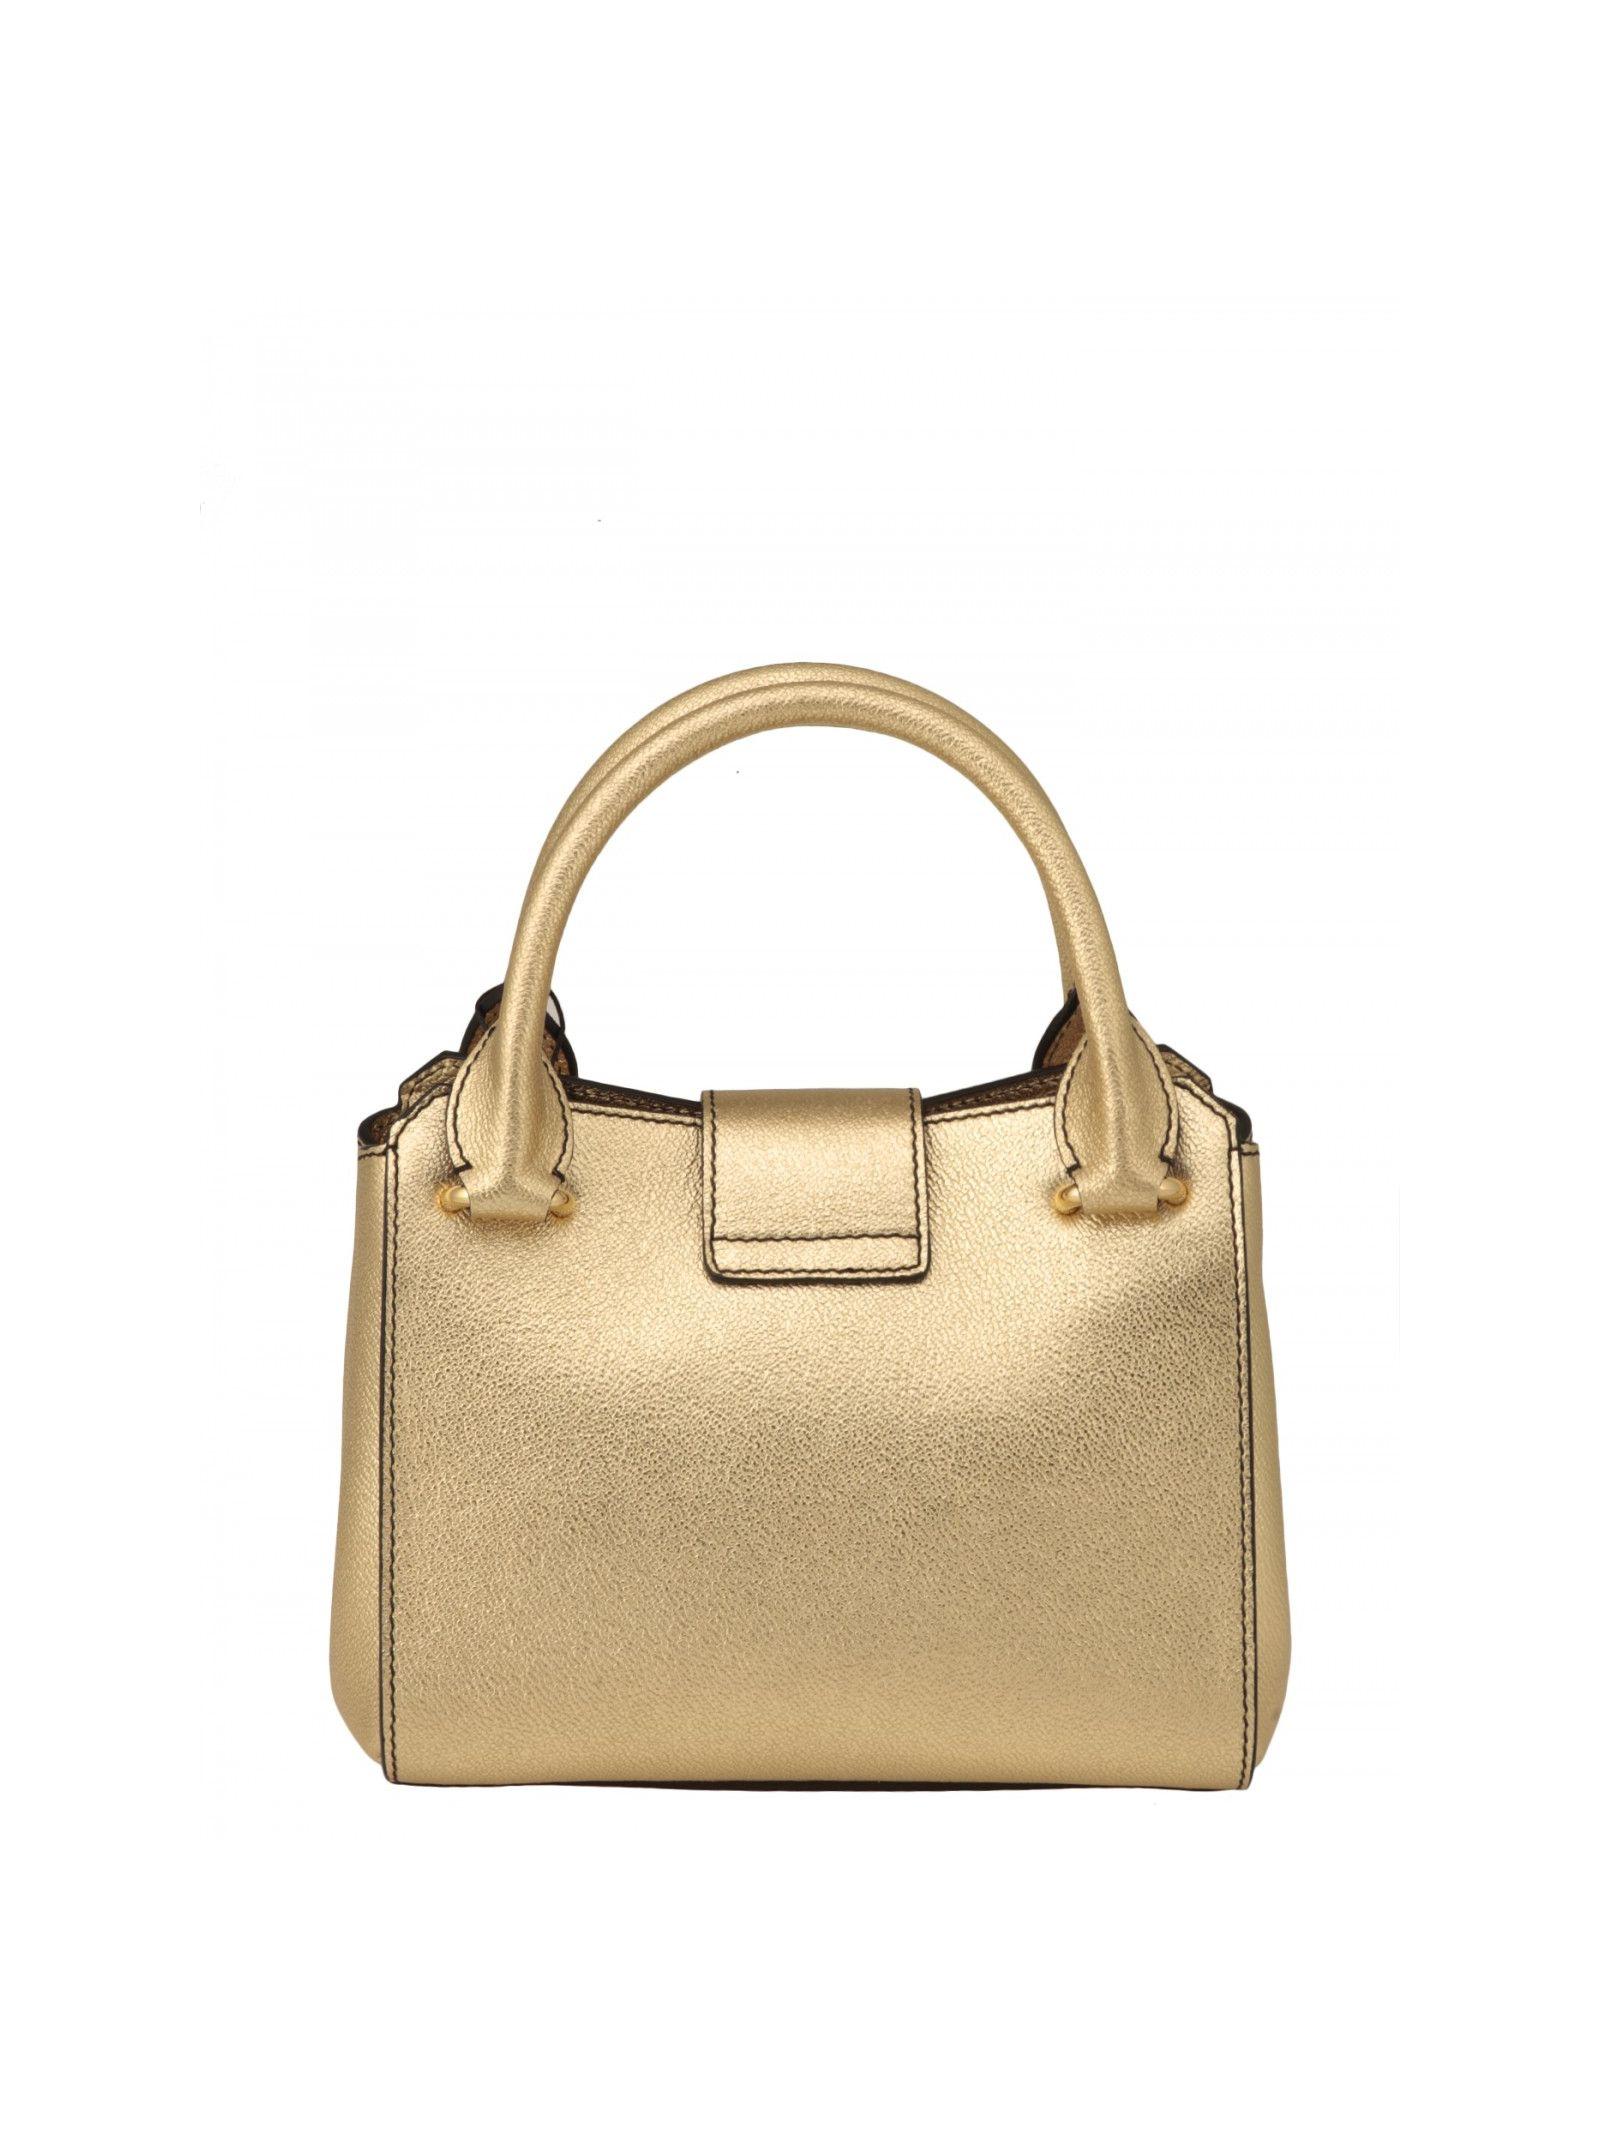 b6a5e8bf0351 Burberry Burberry Metallic Leather Bag - GOLD - 5492360